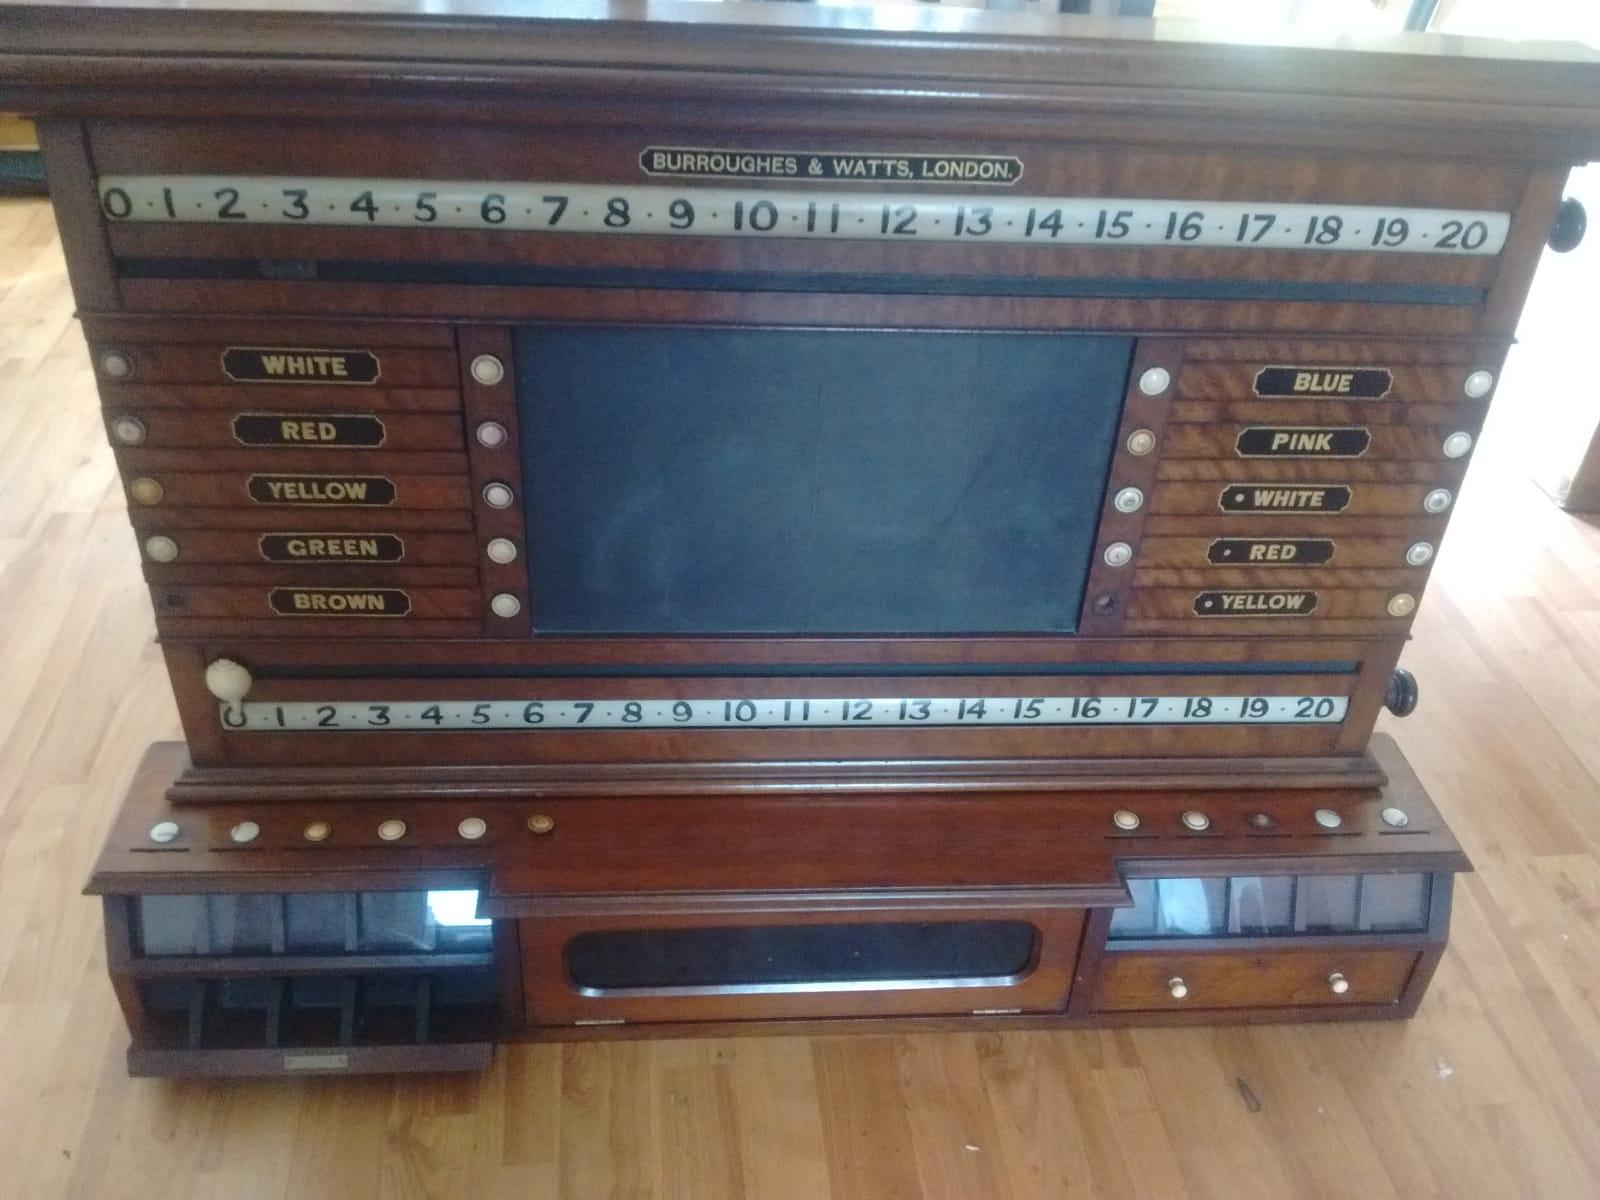 Burroughs-and-Watts-scoreboard-1